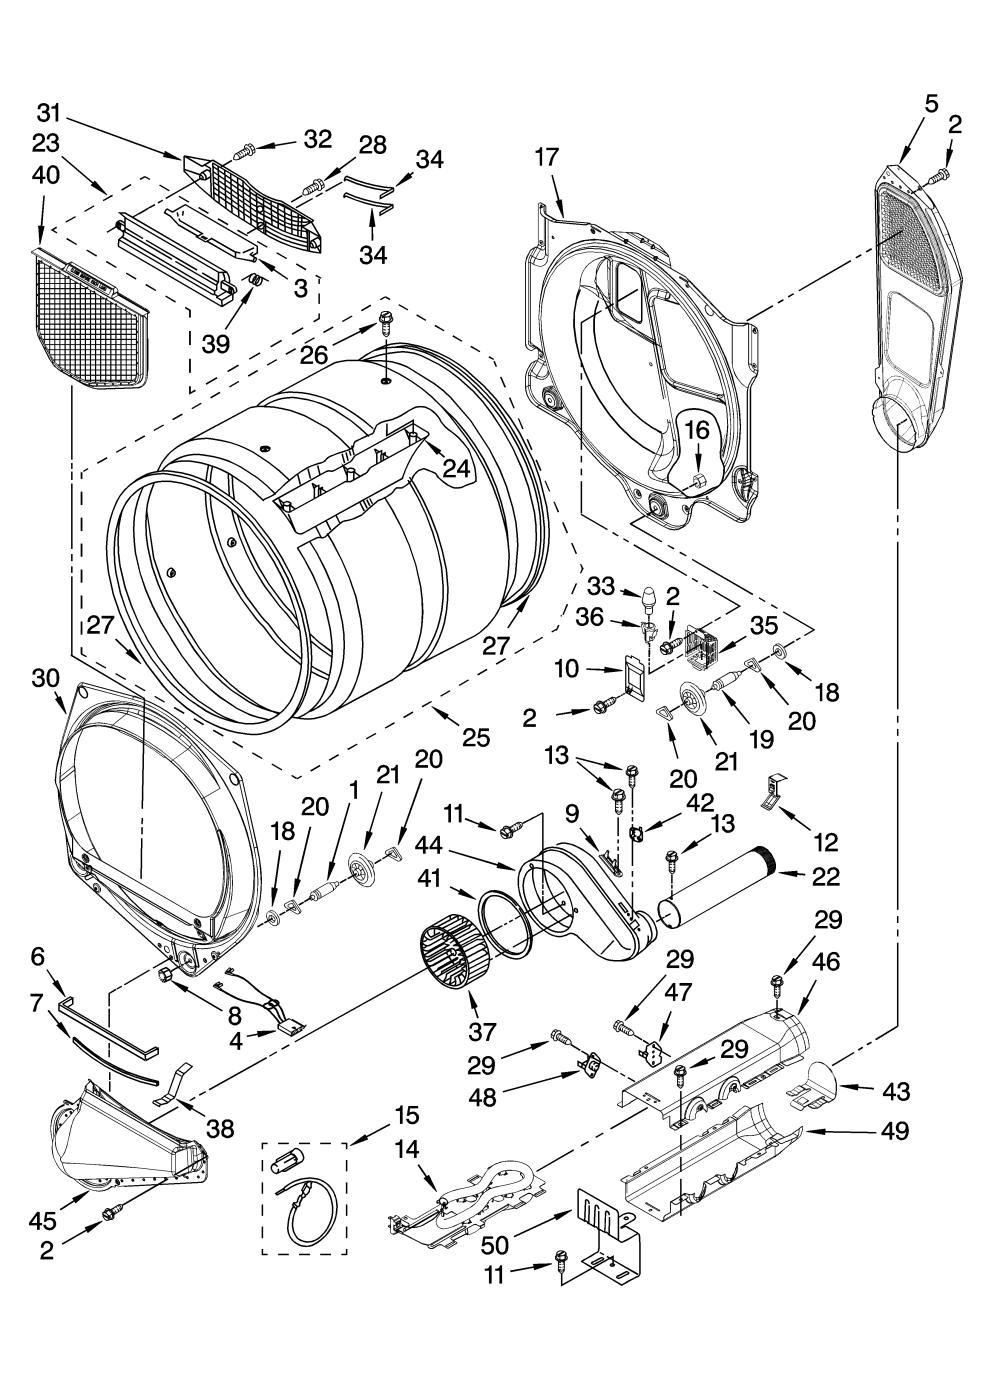 medium resolution of kenmore elite dryer wiring kenmore elite dryer wiring diagram kenmore elite dryer wire diagram kenmore gas